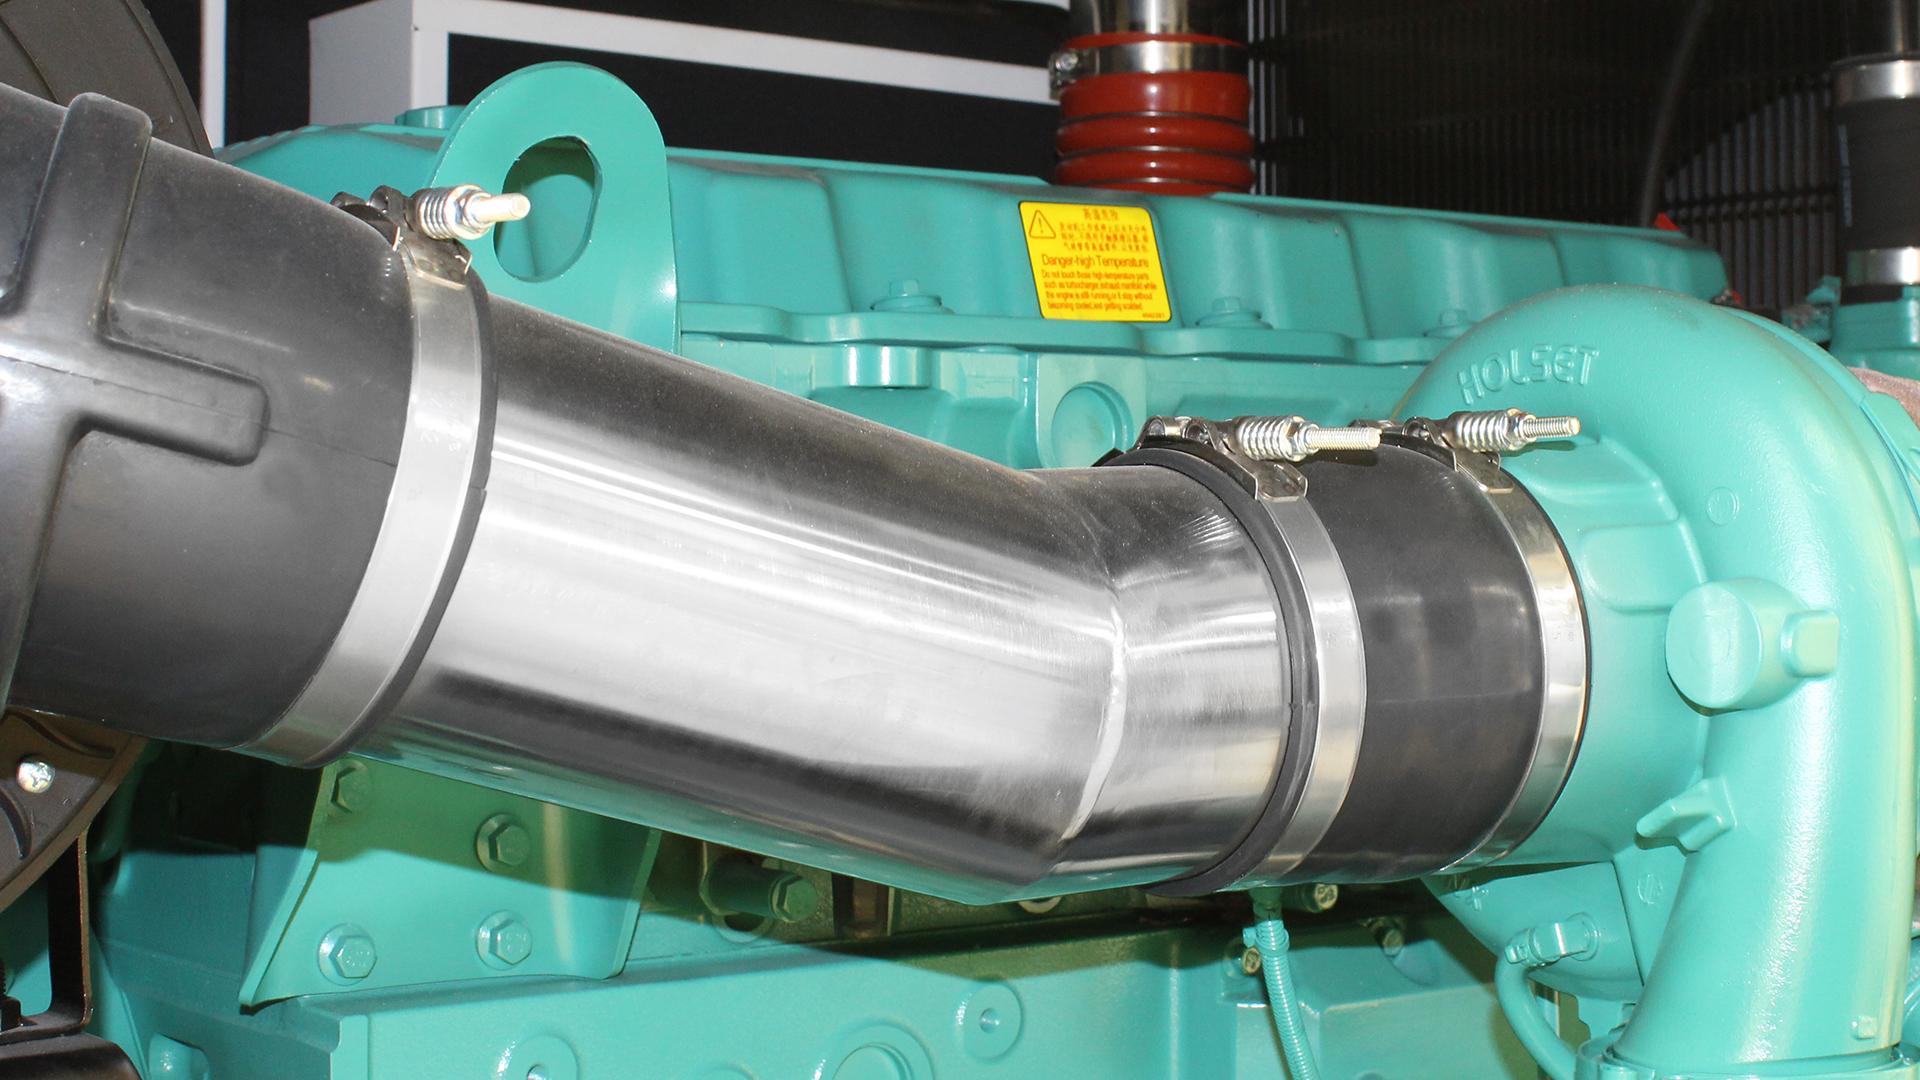 Turbocharger on 550kVA diesel generator set powered by Cummins